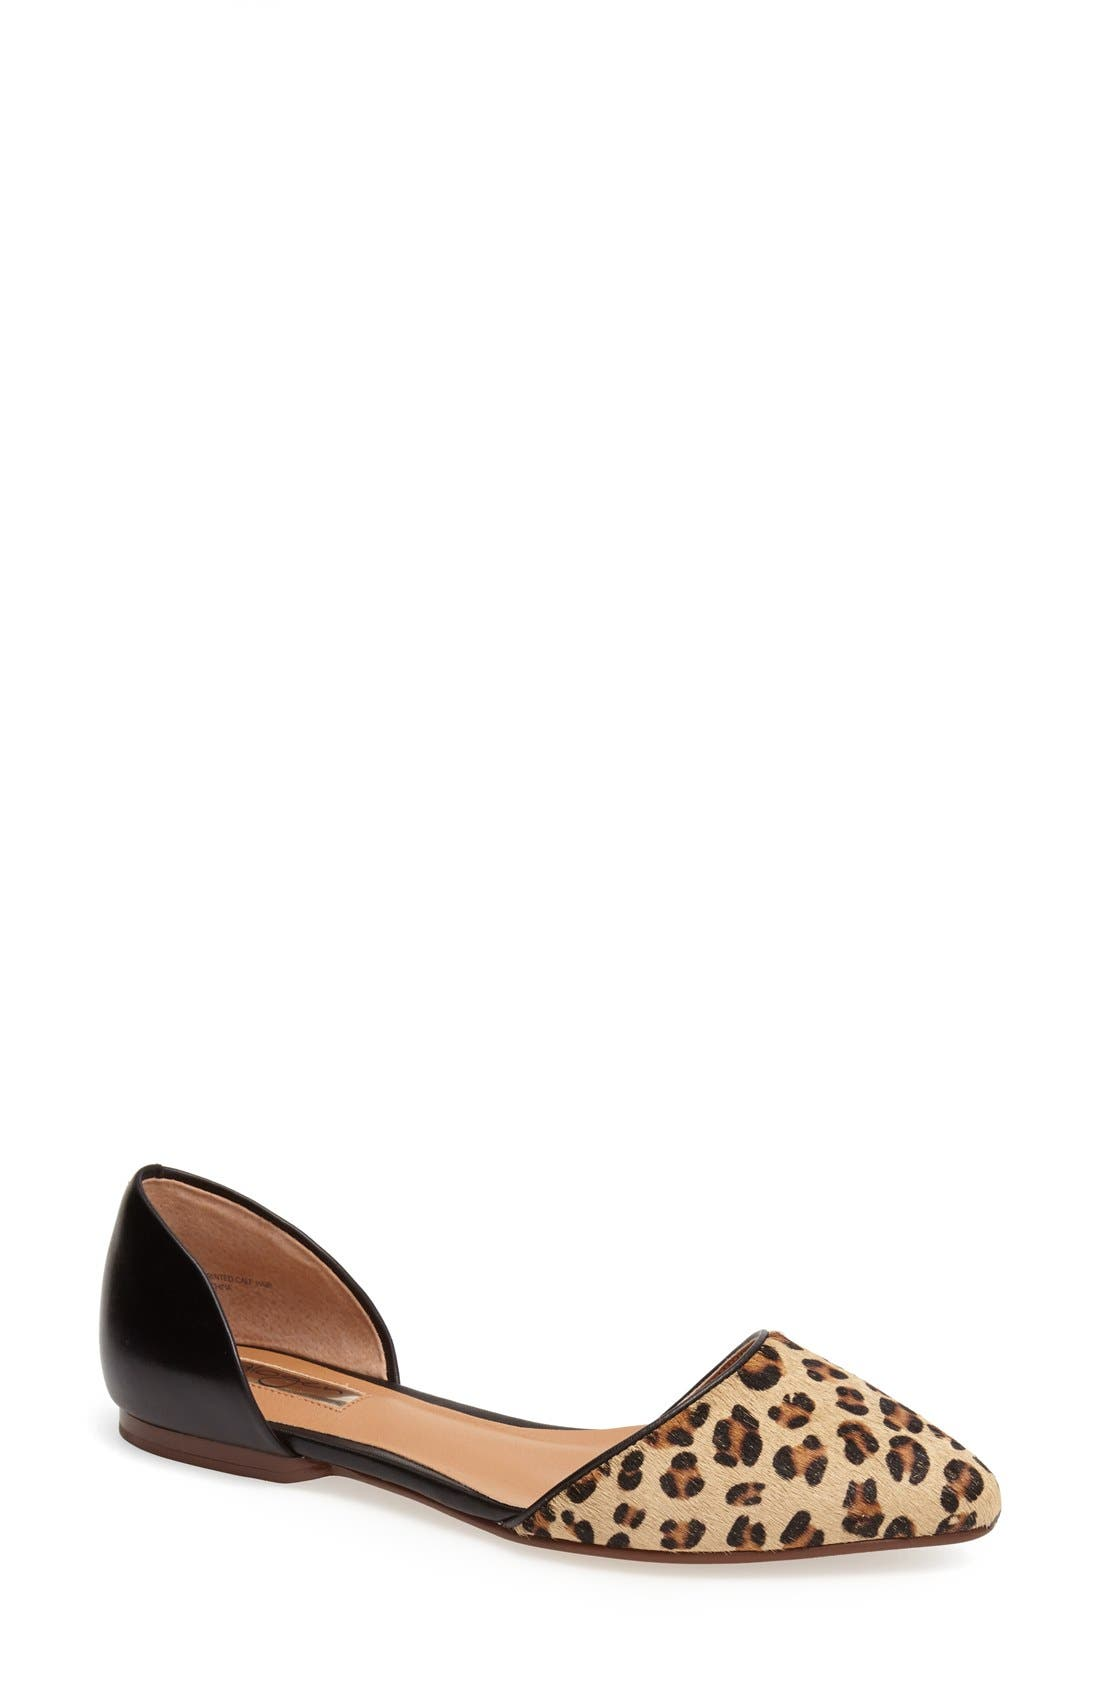 ,                             'Kayla' Leather & Calf Hair Pointy Toe Flat,                             Main thumbnail 1, color,                             240